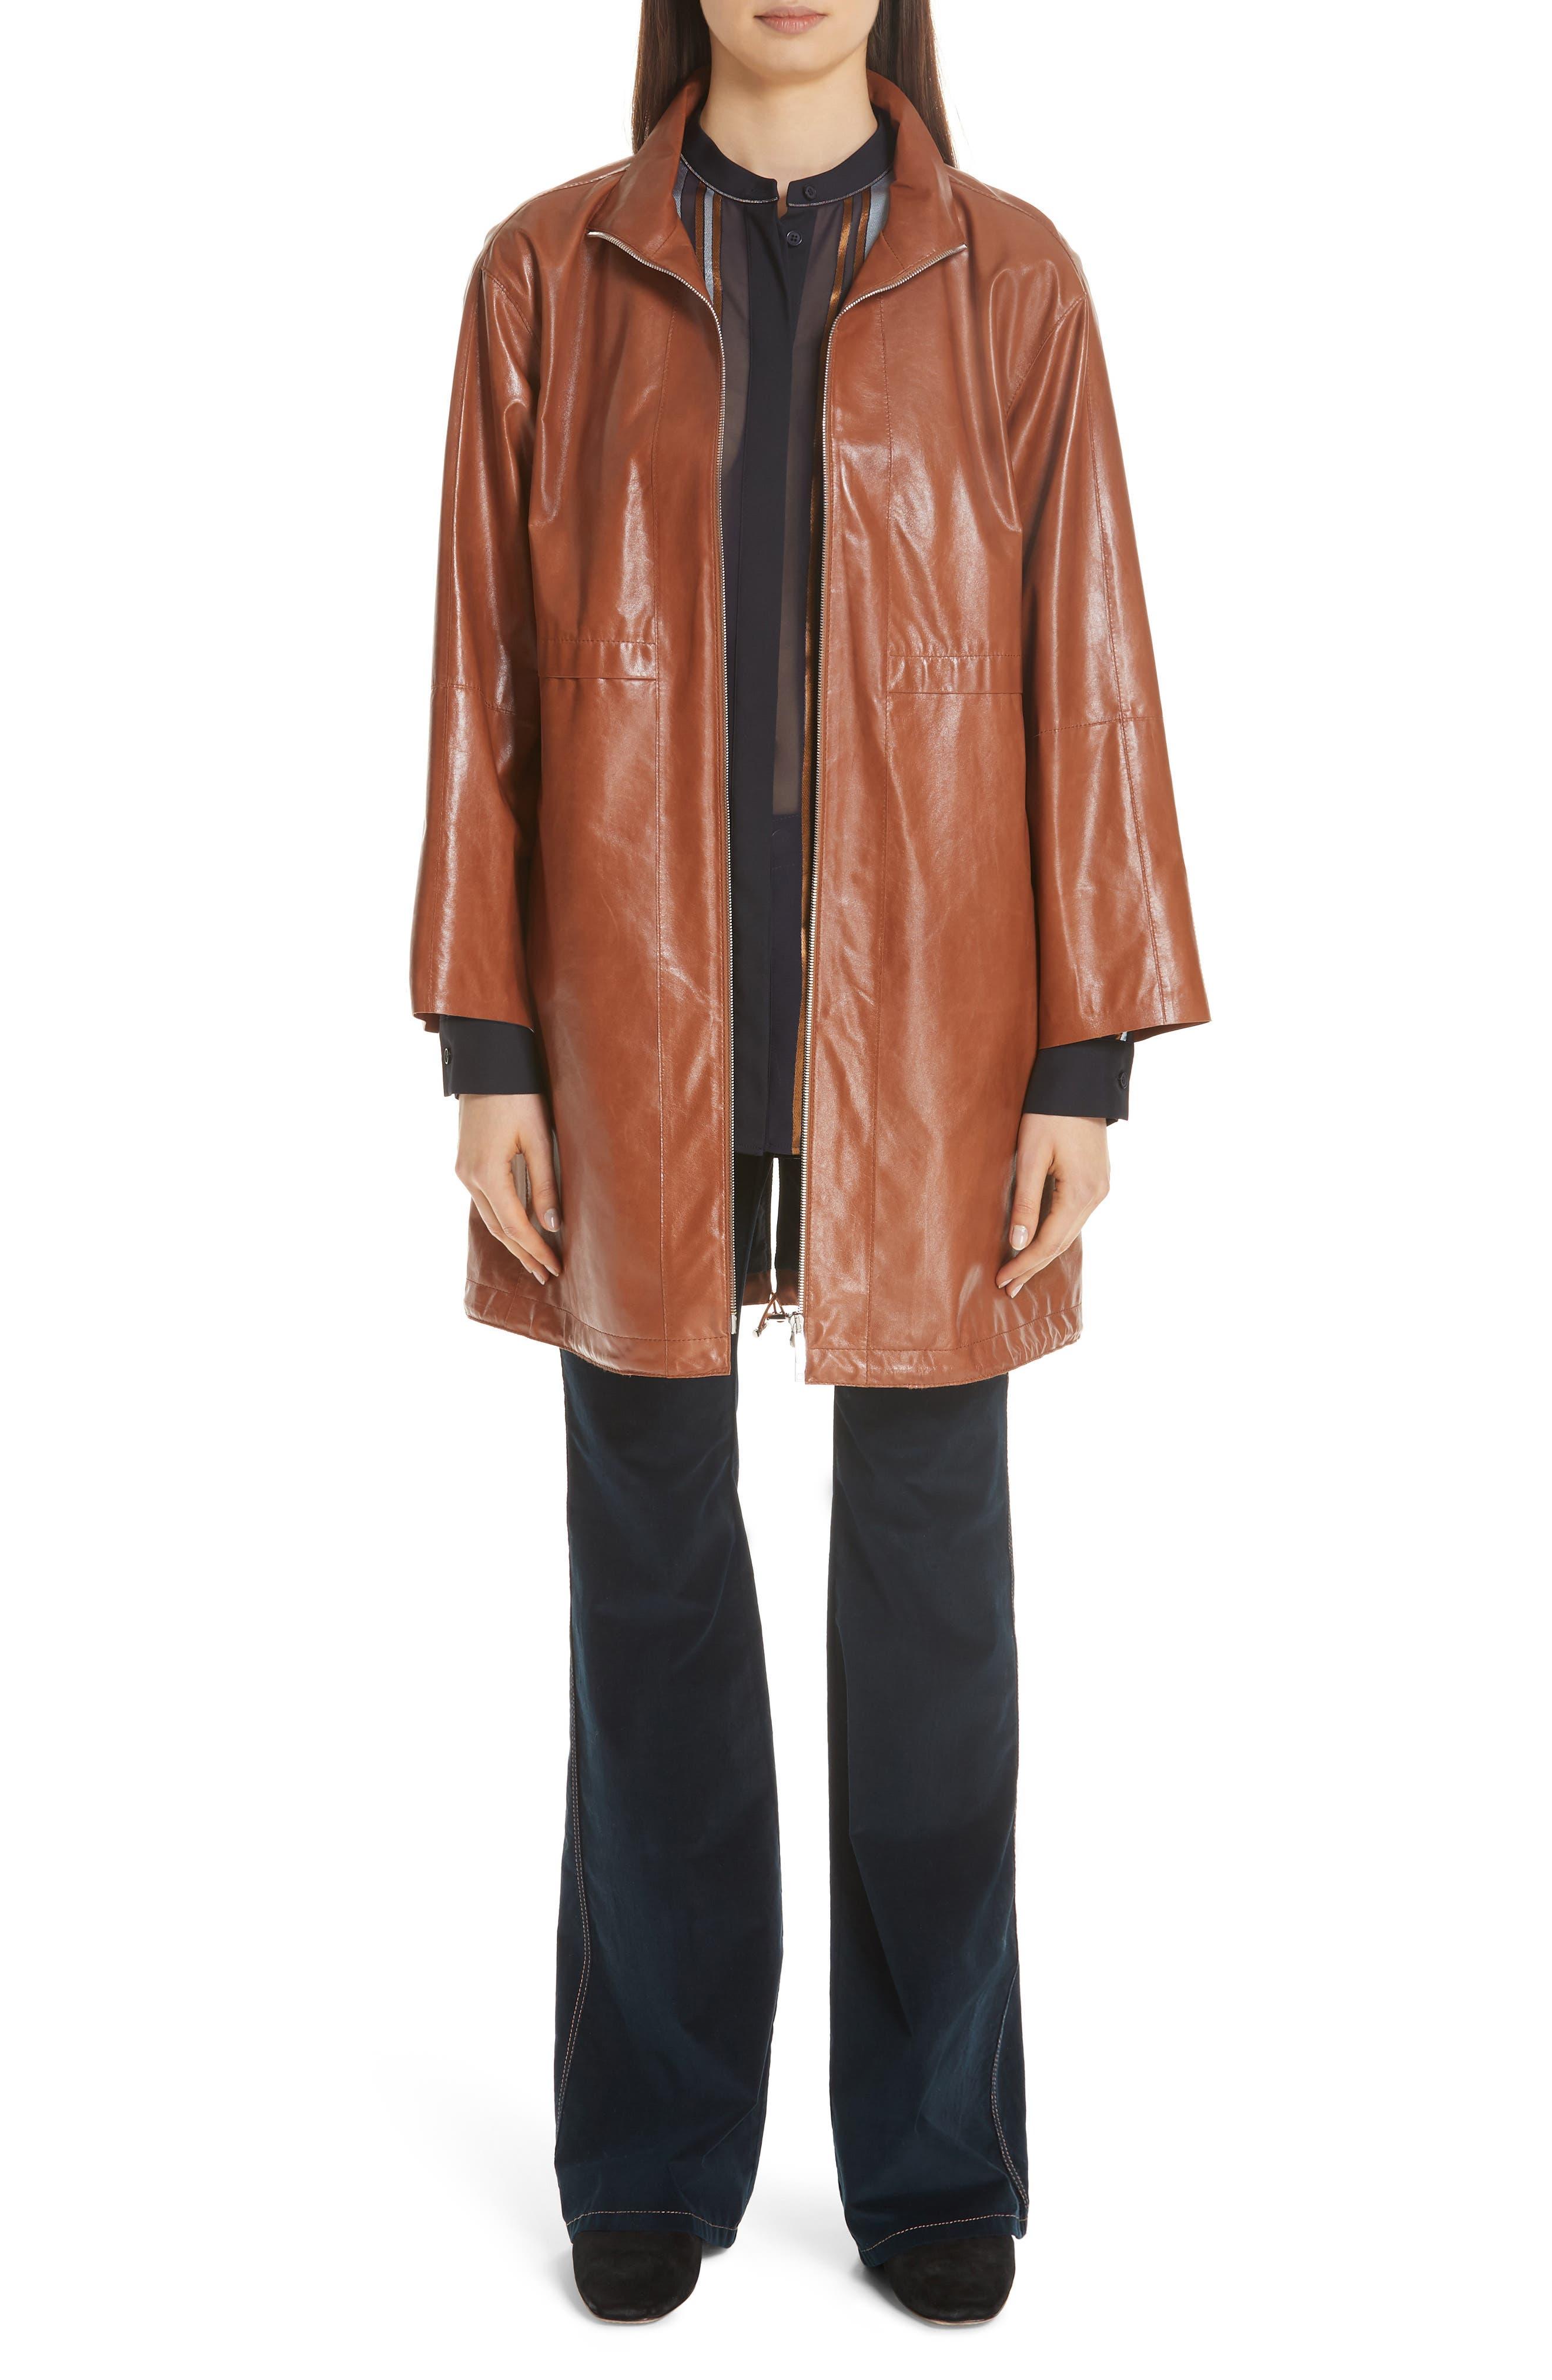 Minerva Leather Jacket,                             Alternate thumbnail 8, color,                             OCHRE